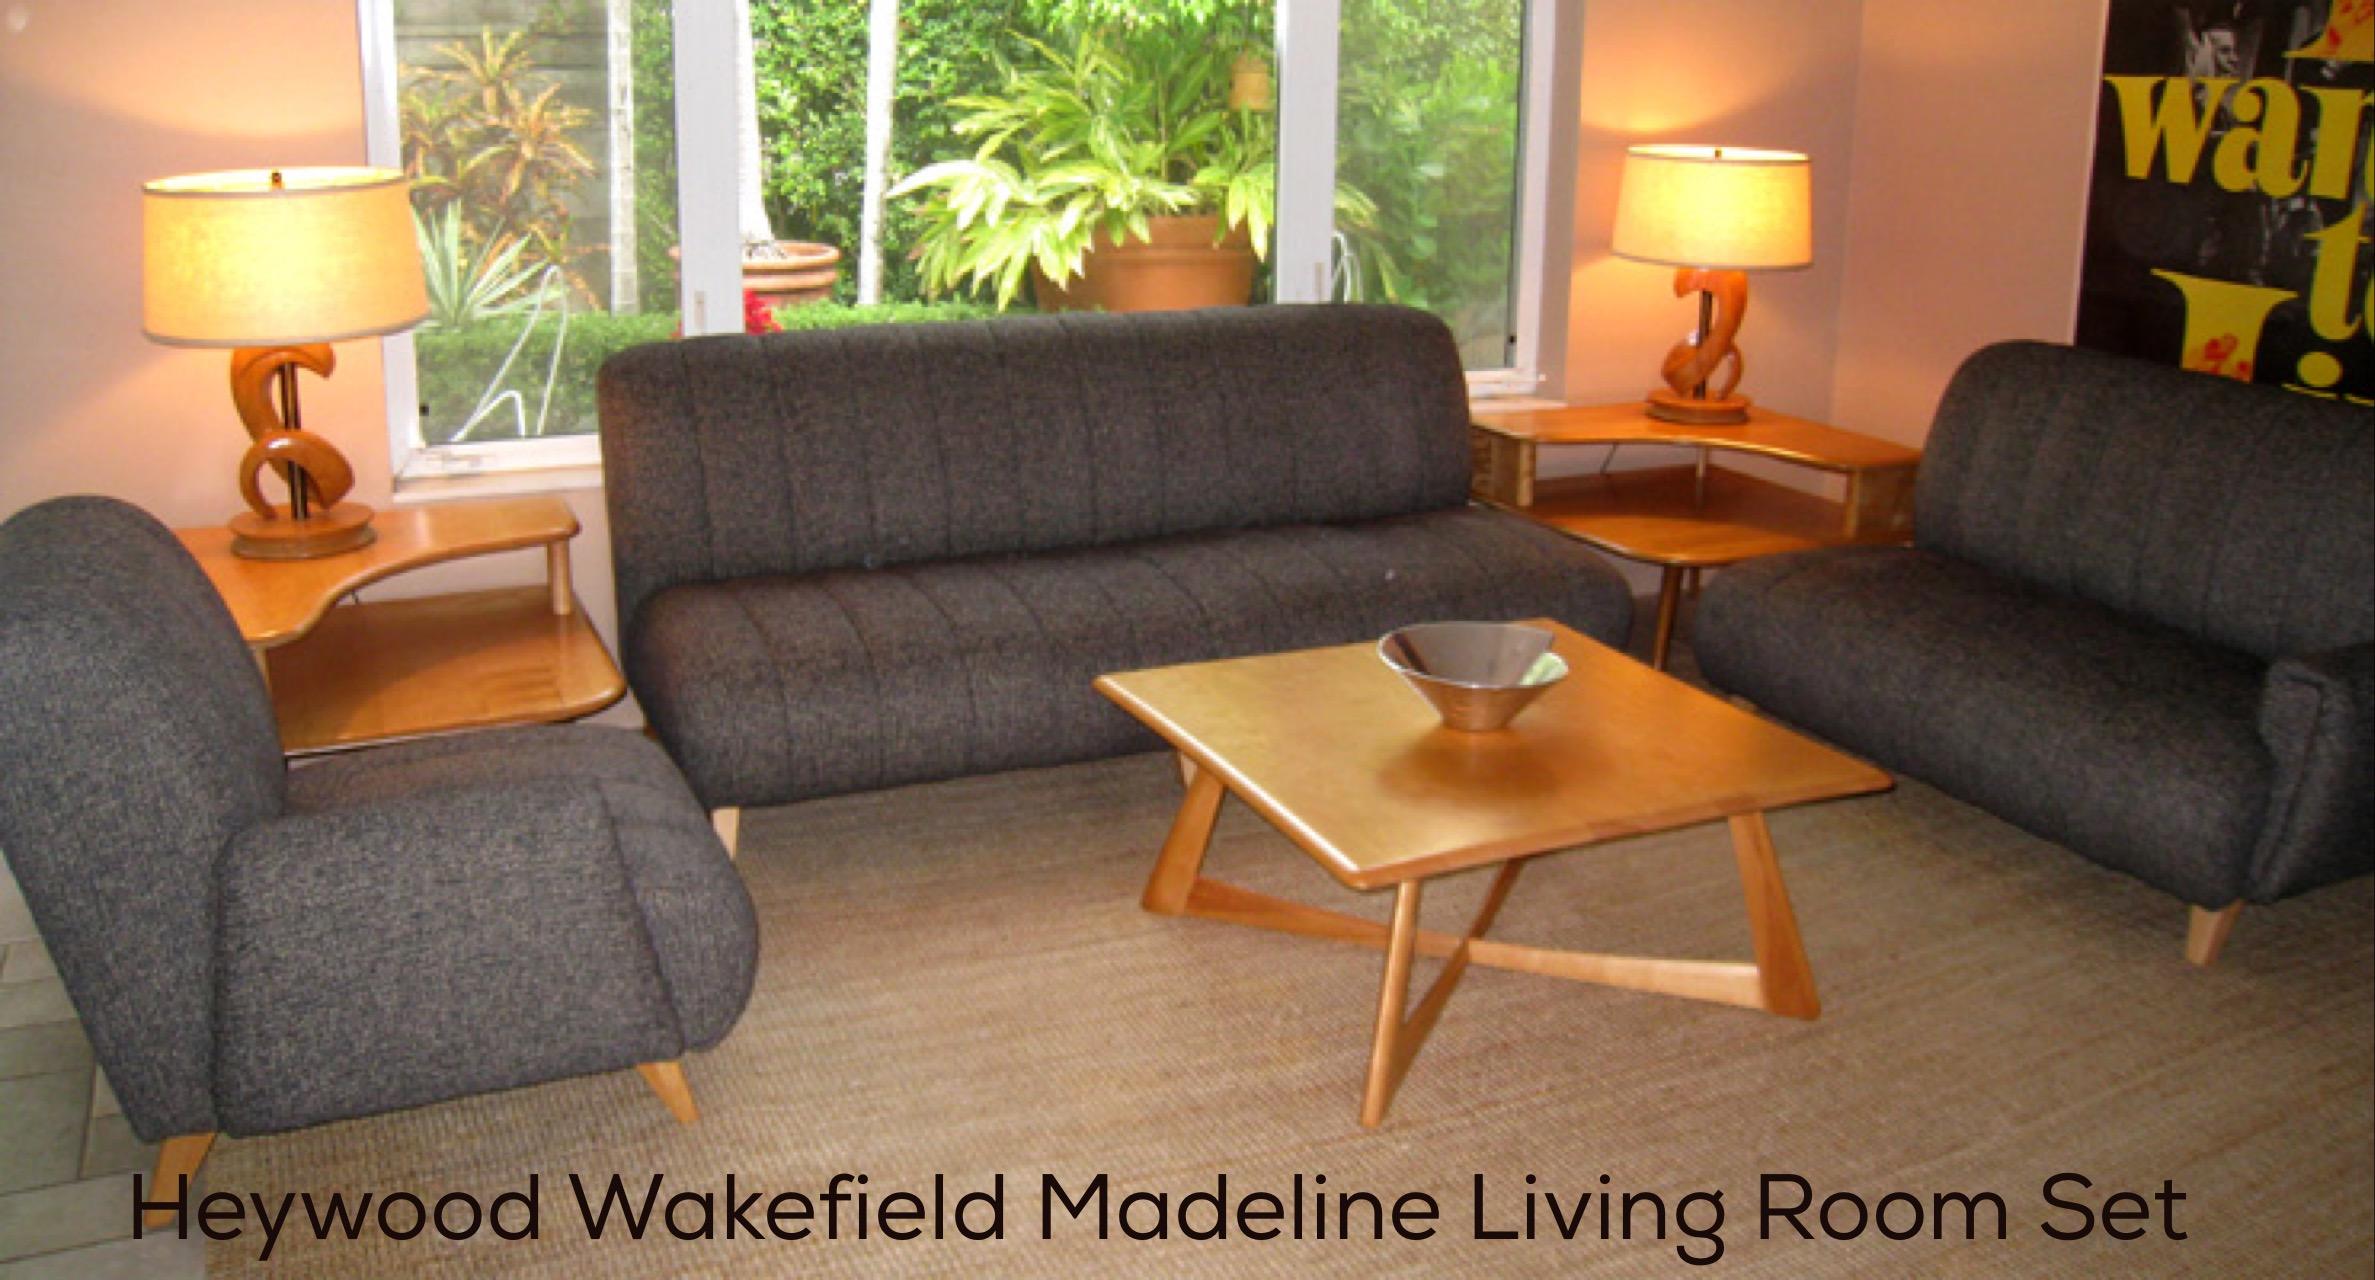 Mod living furniture Living Room Spotlight Heywood Wakefield Modern Furniture Mod Livin Spotlight Heywood Wakefield Modern Furniture Mod Livin Modern